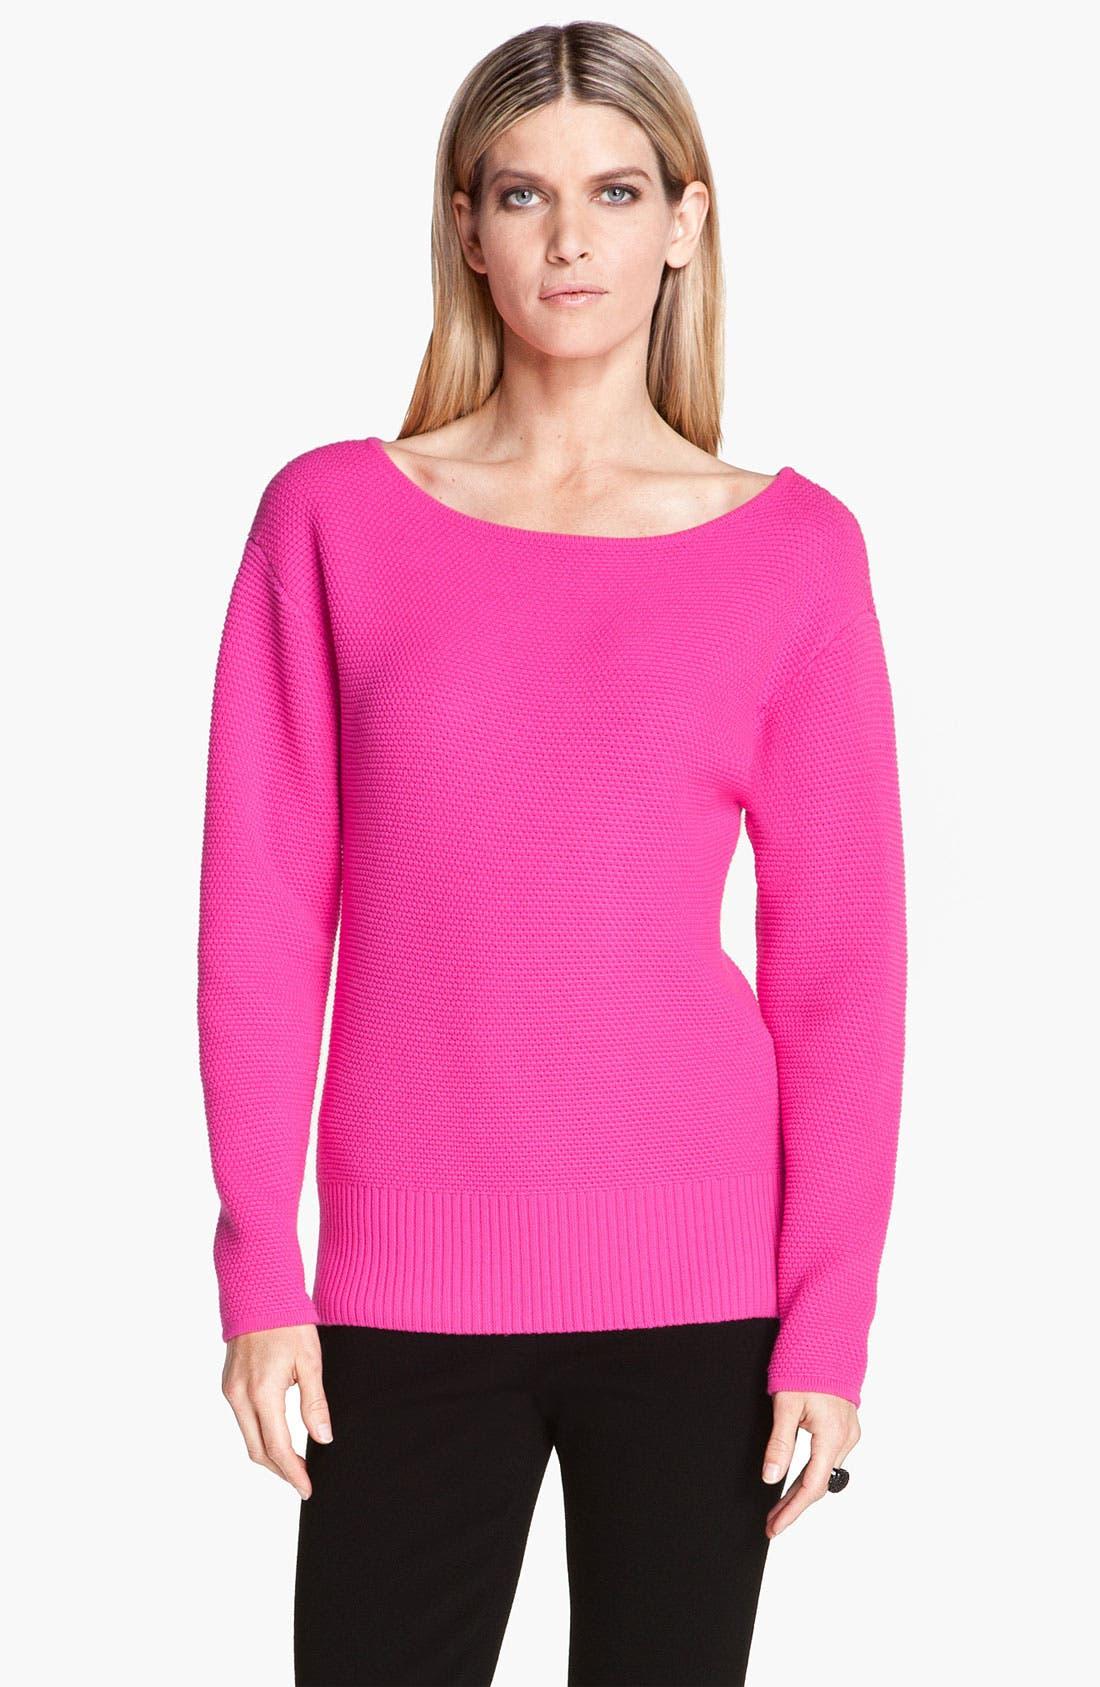 Alternate Image 1 Selected - St. John Yellow Label Micro Piqué Knit Sweater